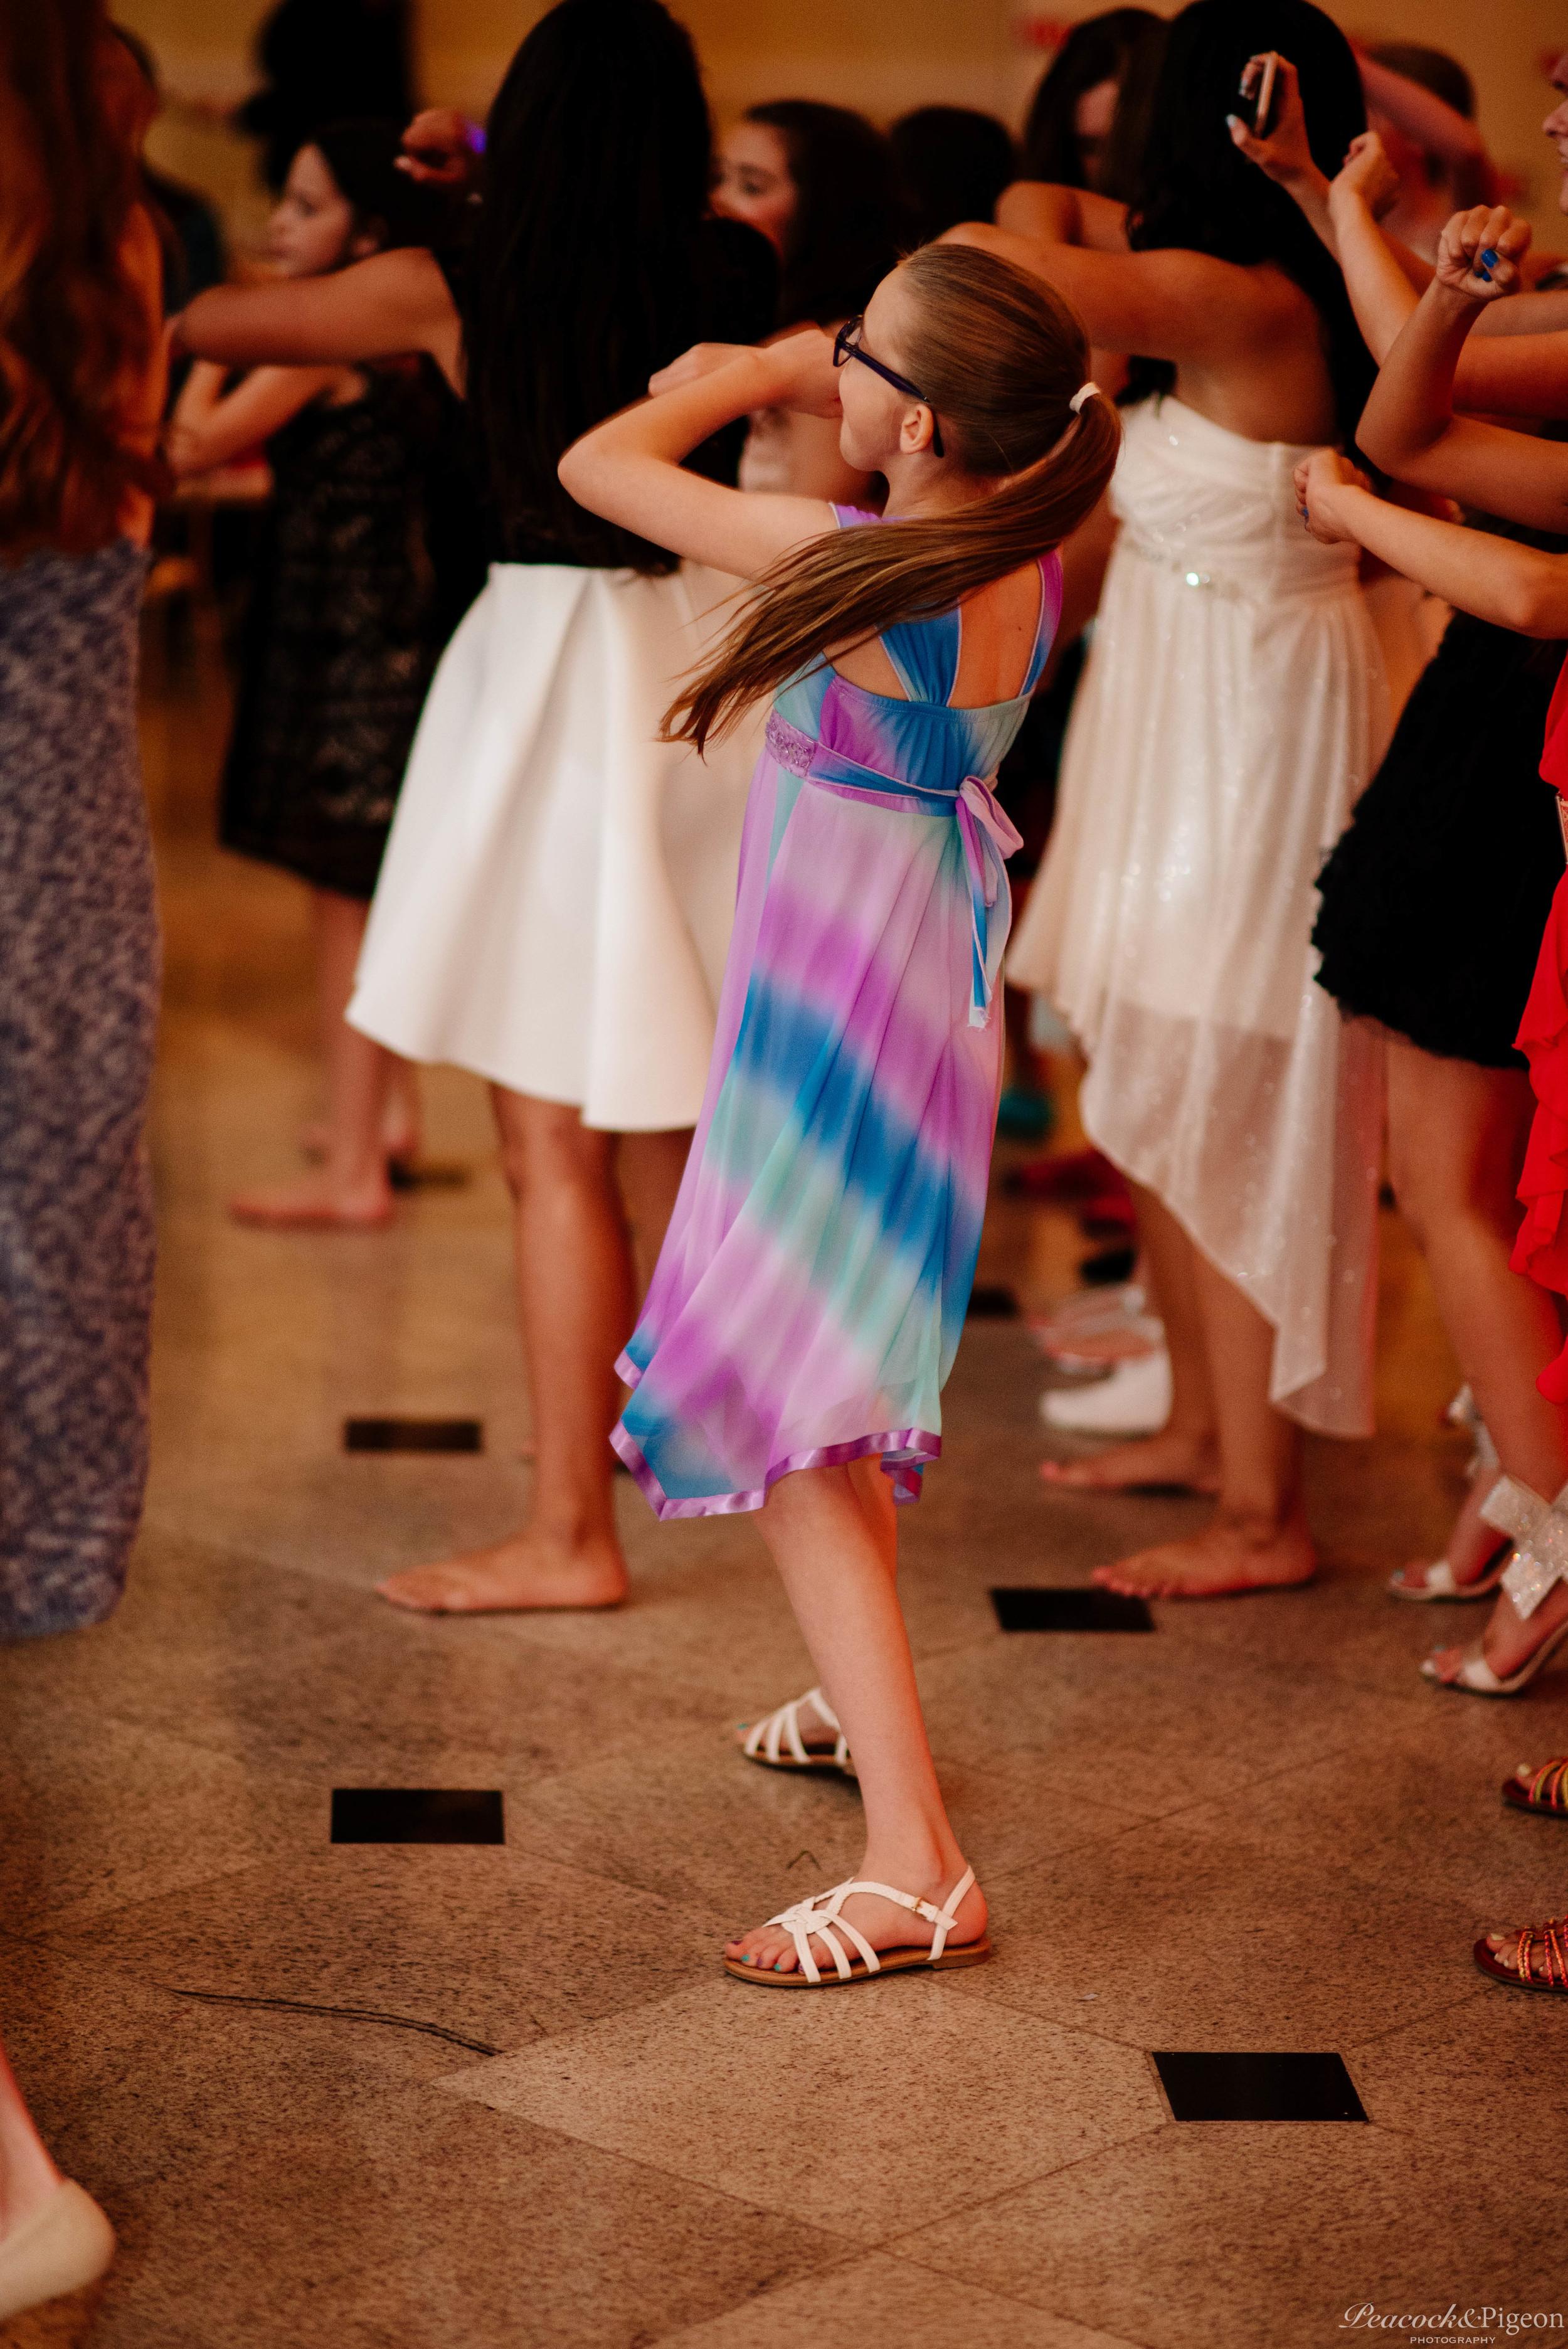 Next_Level_All_Star_Dance_School_Part_Two-W-30-141.jpg